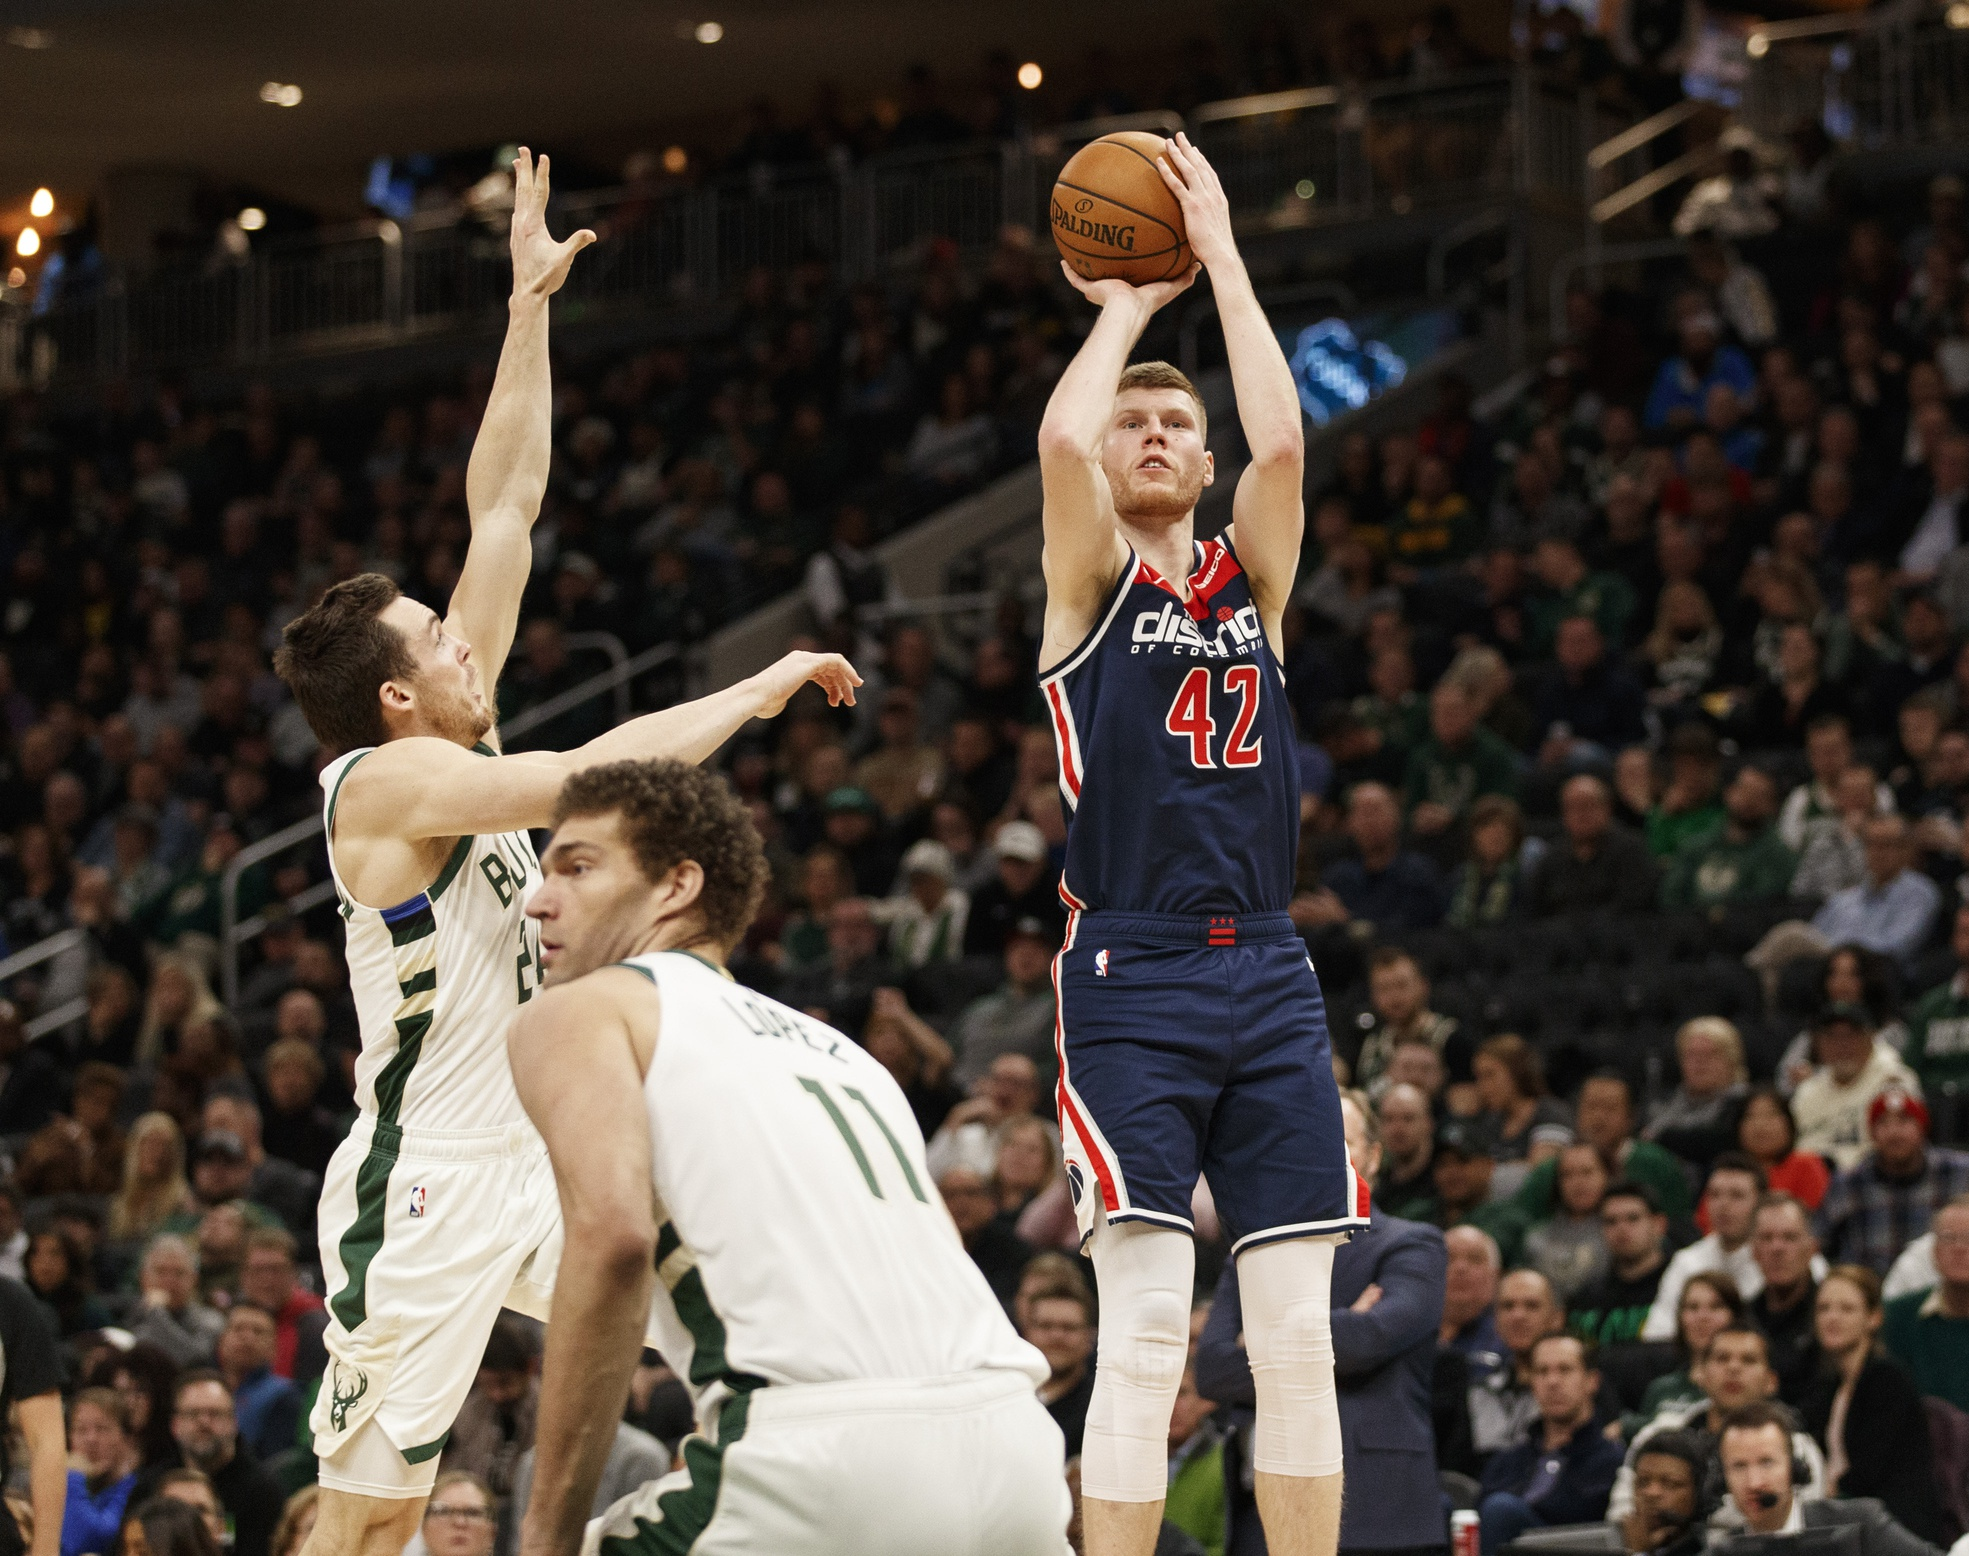 Report: Celtics with strong interest in Davis Bertans